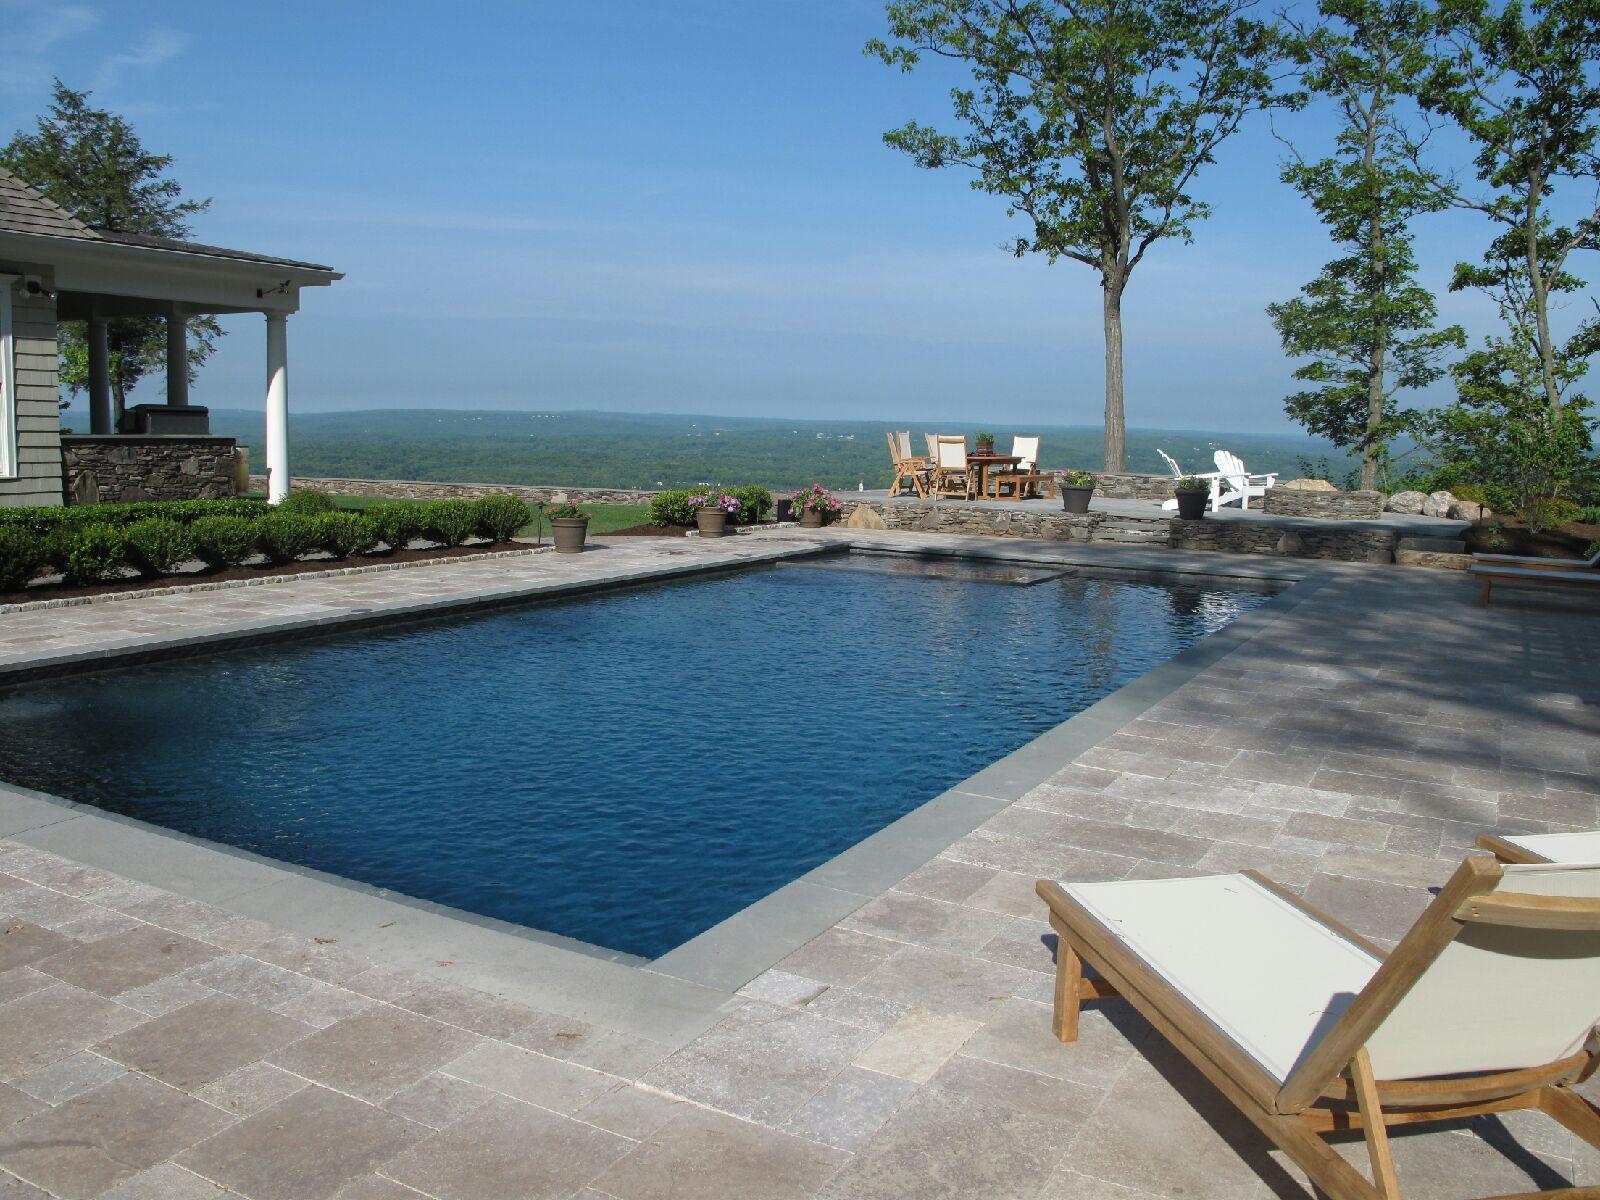 Avon Formal Pool Contractor